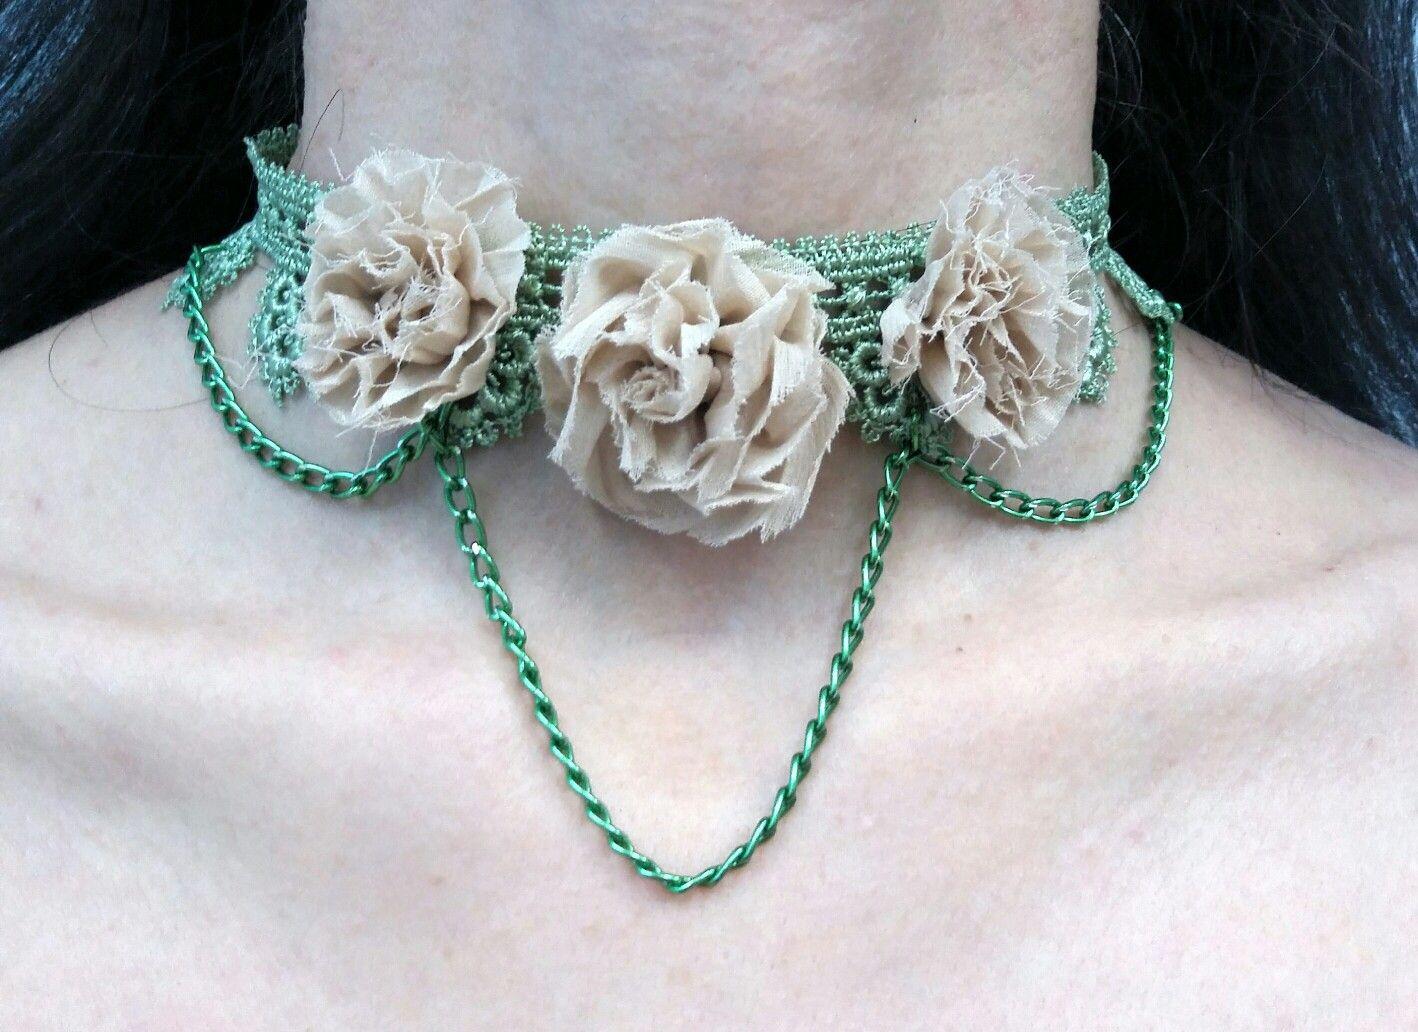 Instagram.com/estersumman.#jewelry #gioielli #choker #collane #necklace #колье